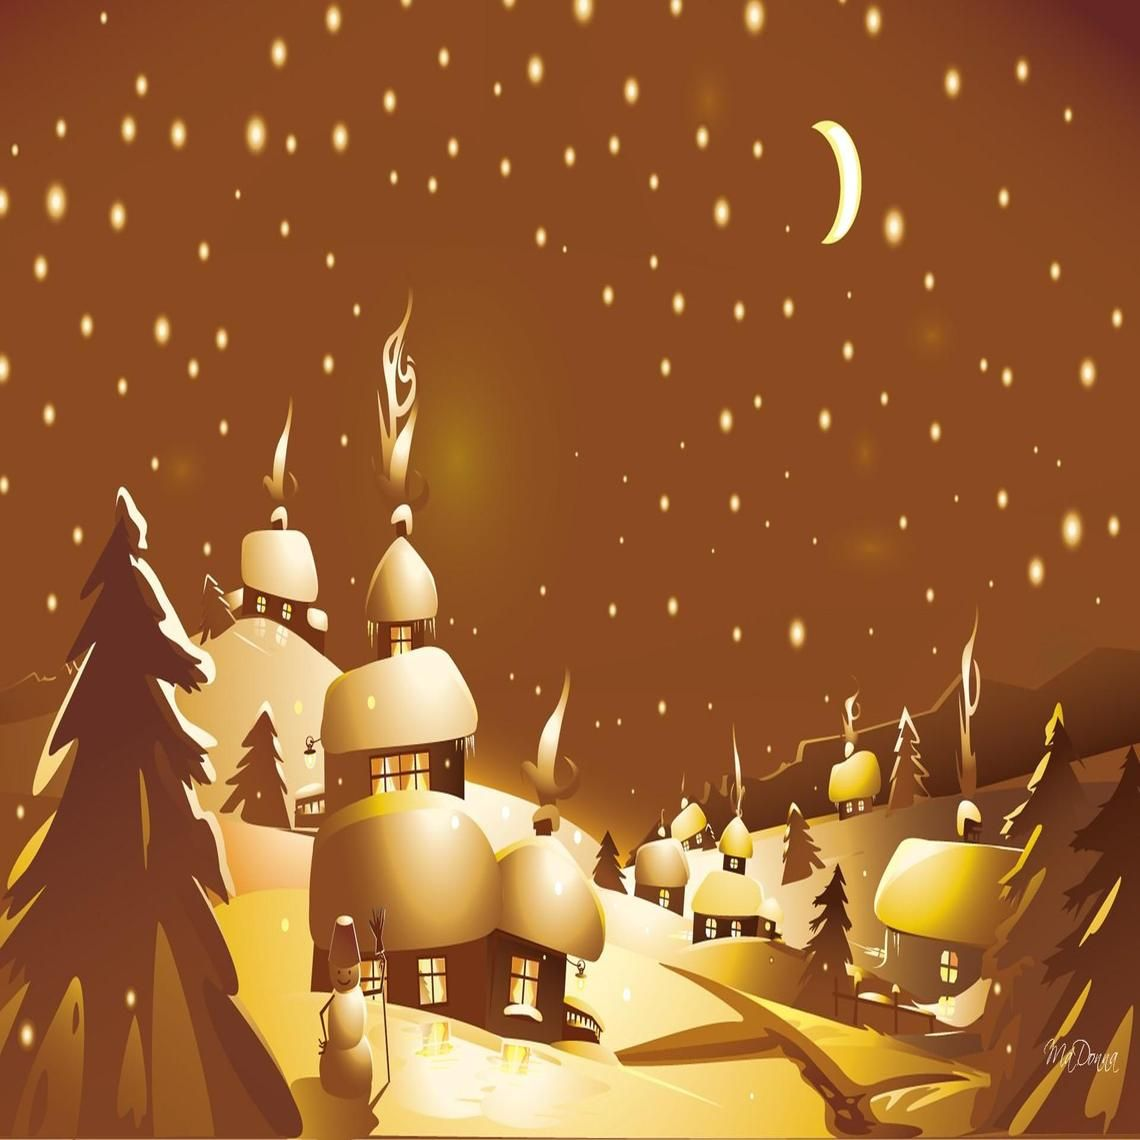 Golden Winter Night